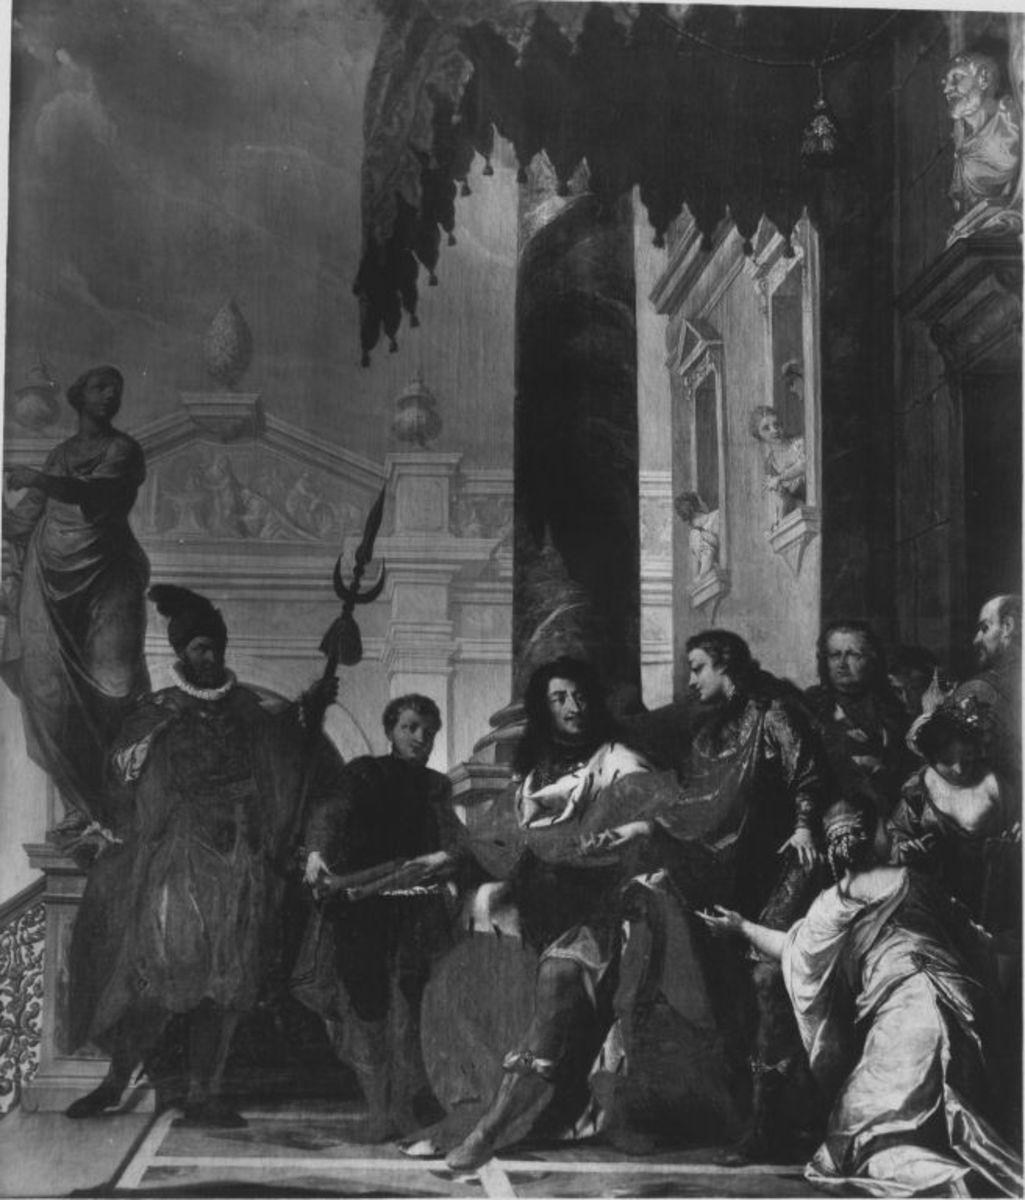 Kurfürst Johann Wilhelm übergibt den Kommandostab